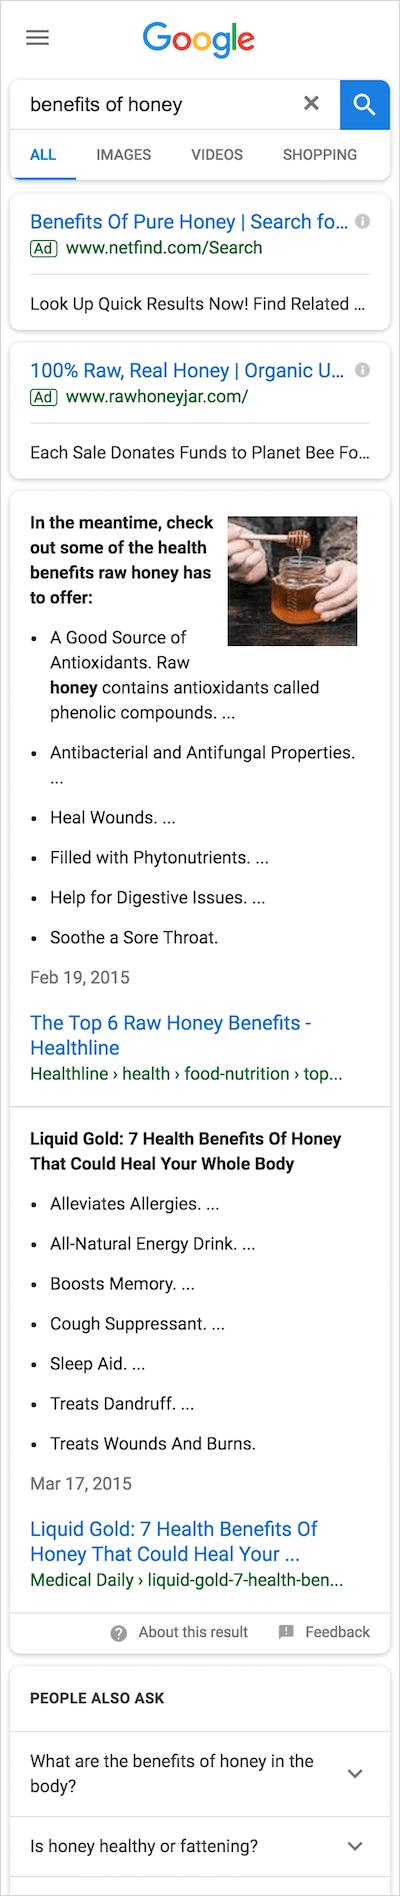 「benfits of honey」のマルチファセット強調スニペット